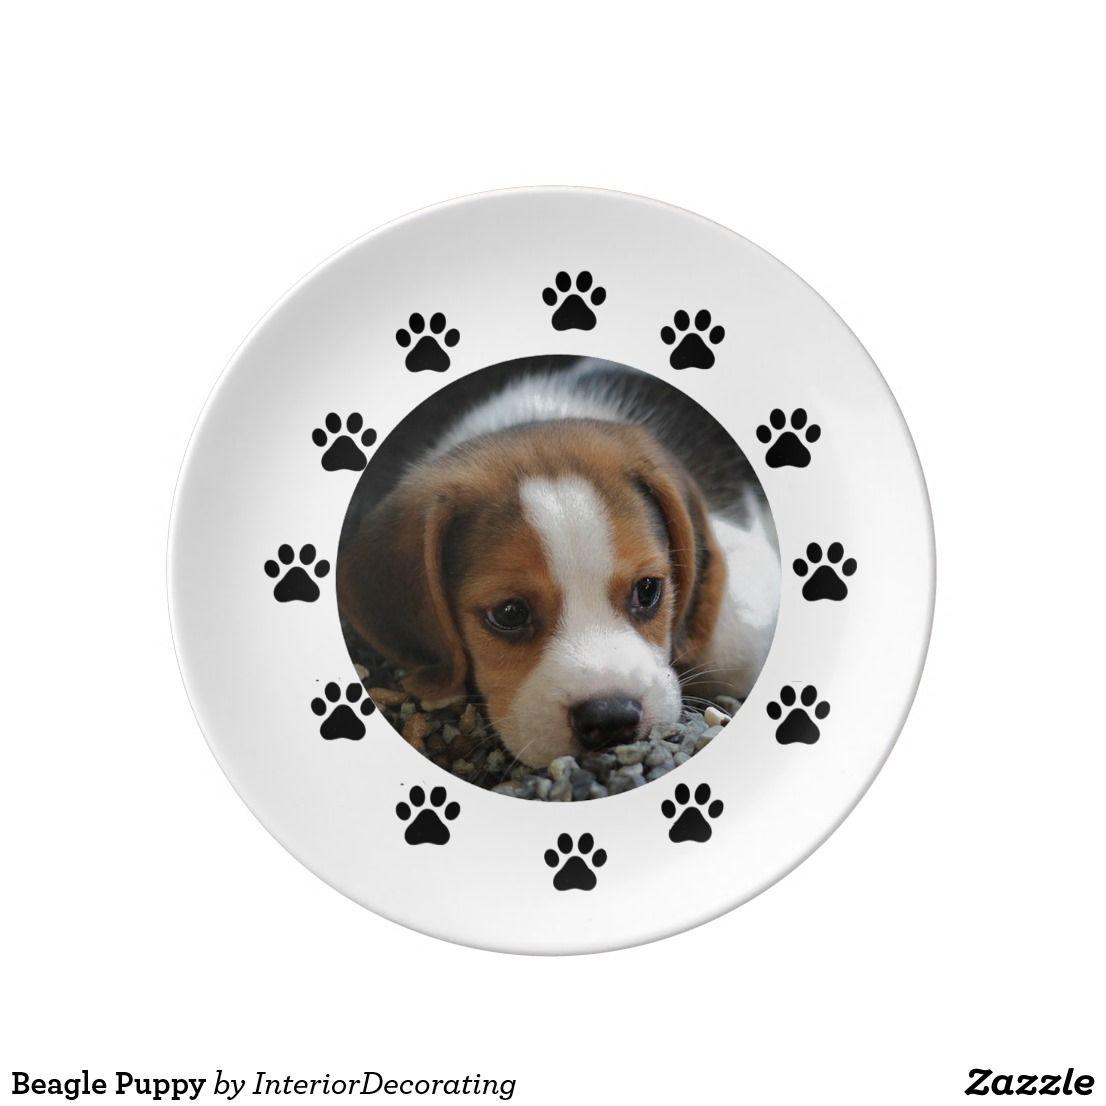 Beagle Puppy Dinner Plate Zazzle Com Beagle Puppy Beagle Puppies